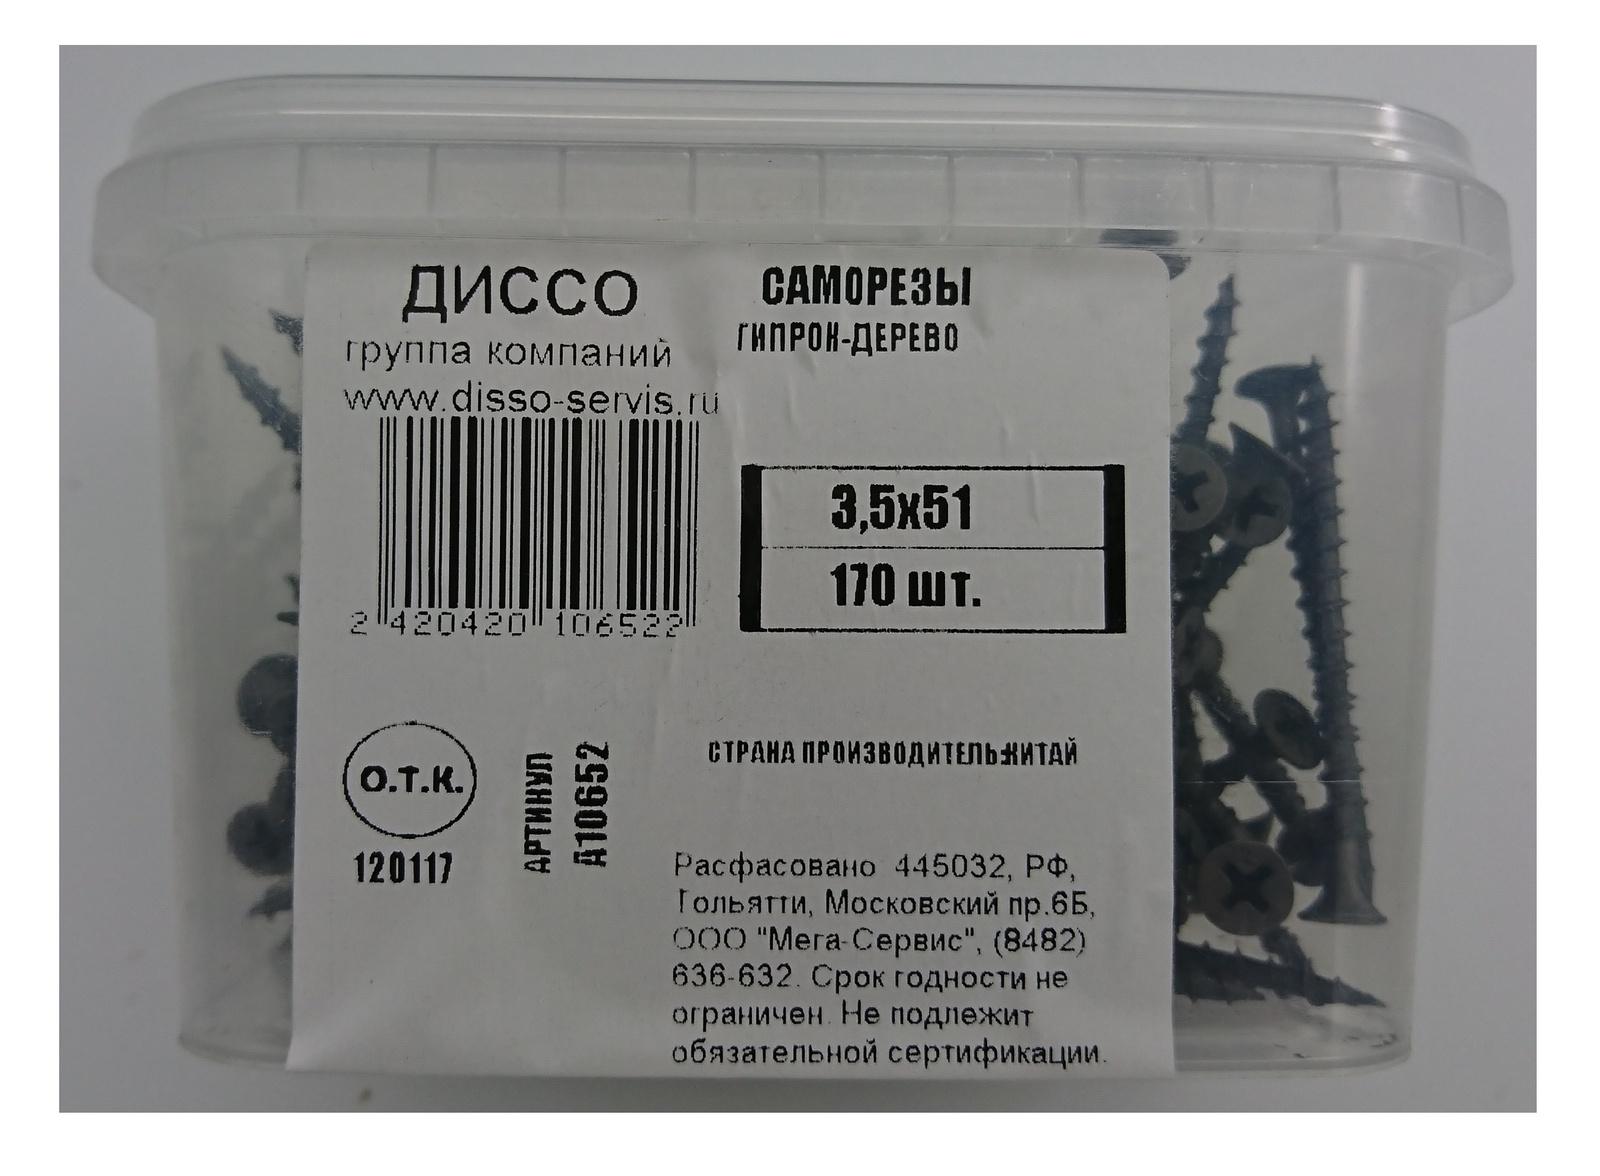 все цены на Саморез ДИССО гипсокартон-дерево 3,5х51 (170 шт. в контейнере) онлайн